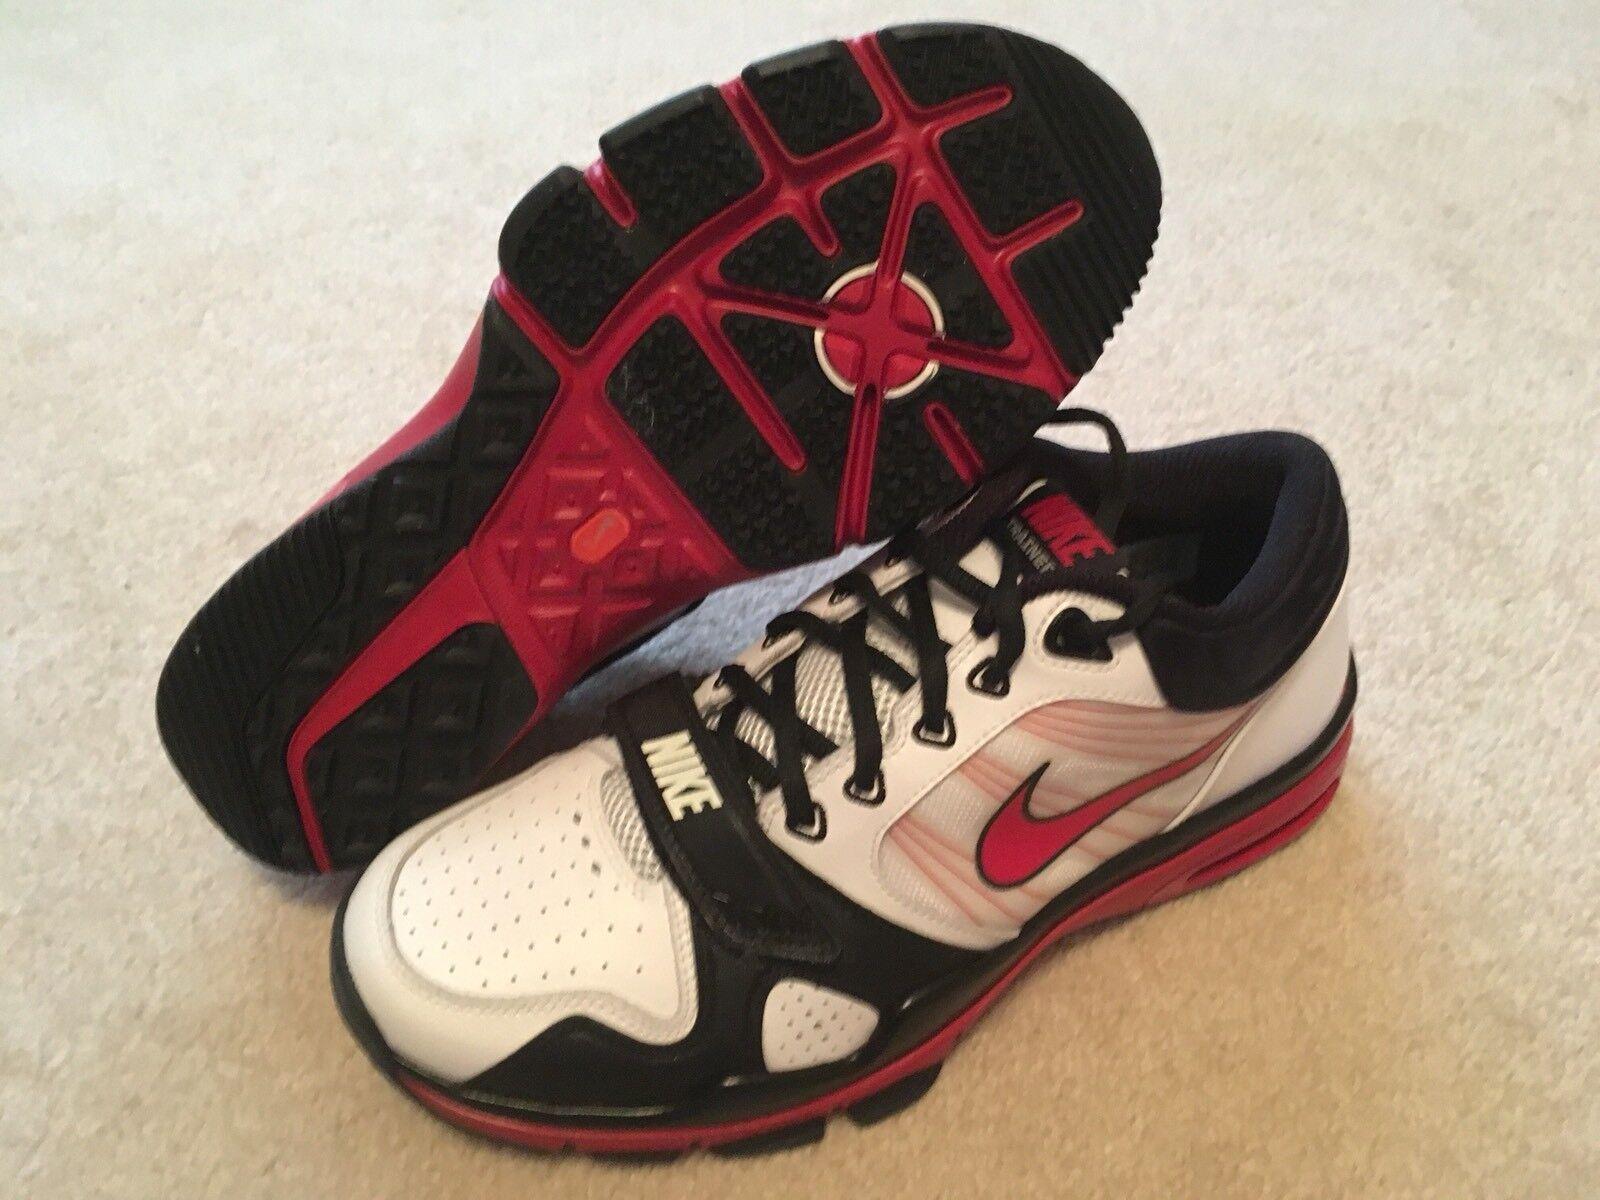 Nike Trainer 1.2 Brandon Roy Sample Sz 9 Rare Nike Promo Sample